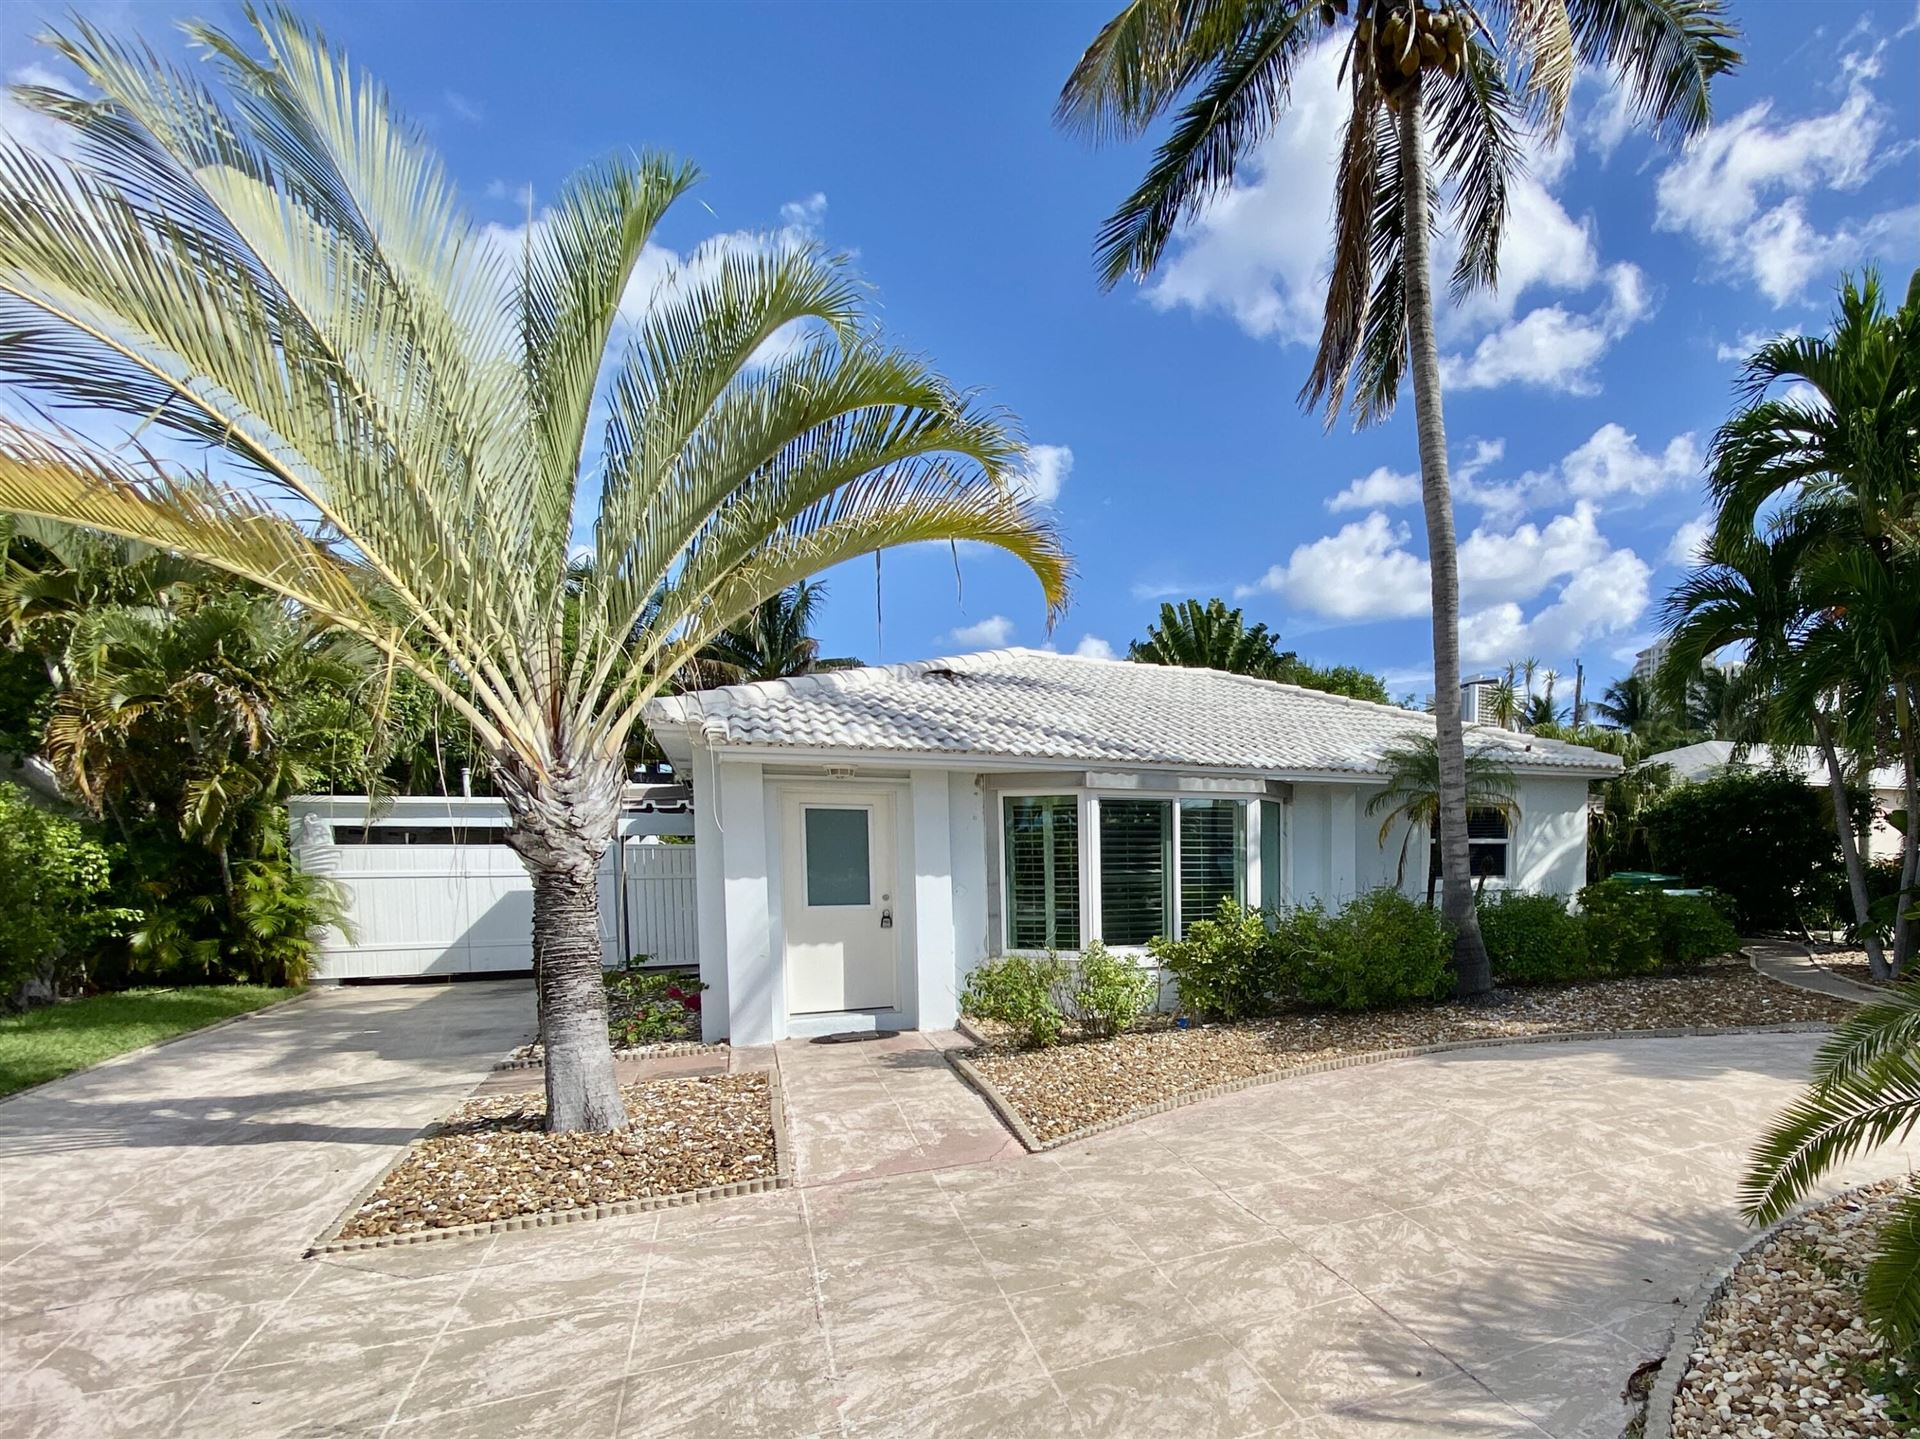 Photo of 1140 Beach Road, Riviera Beach, FL 33404 (MLS # RX-10748821)